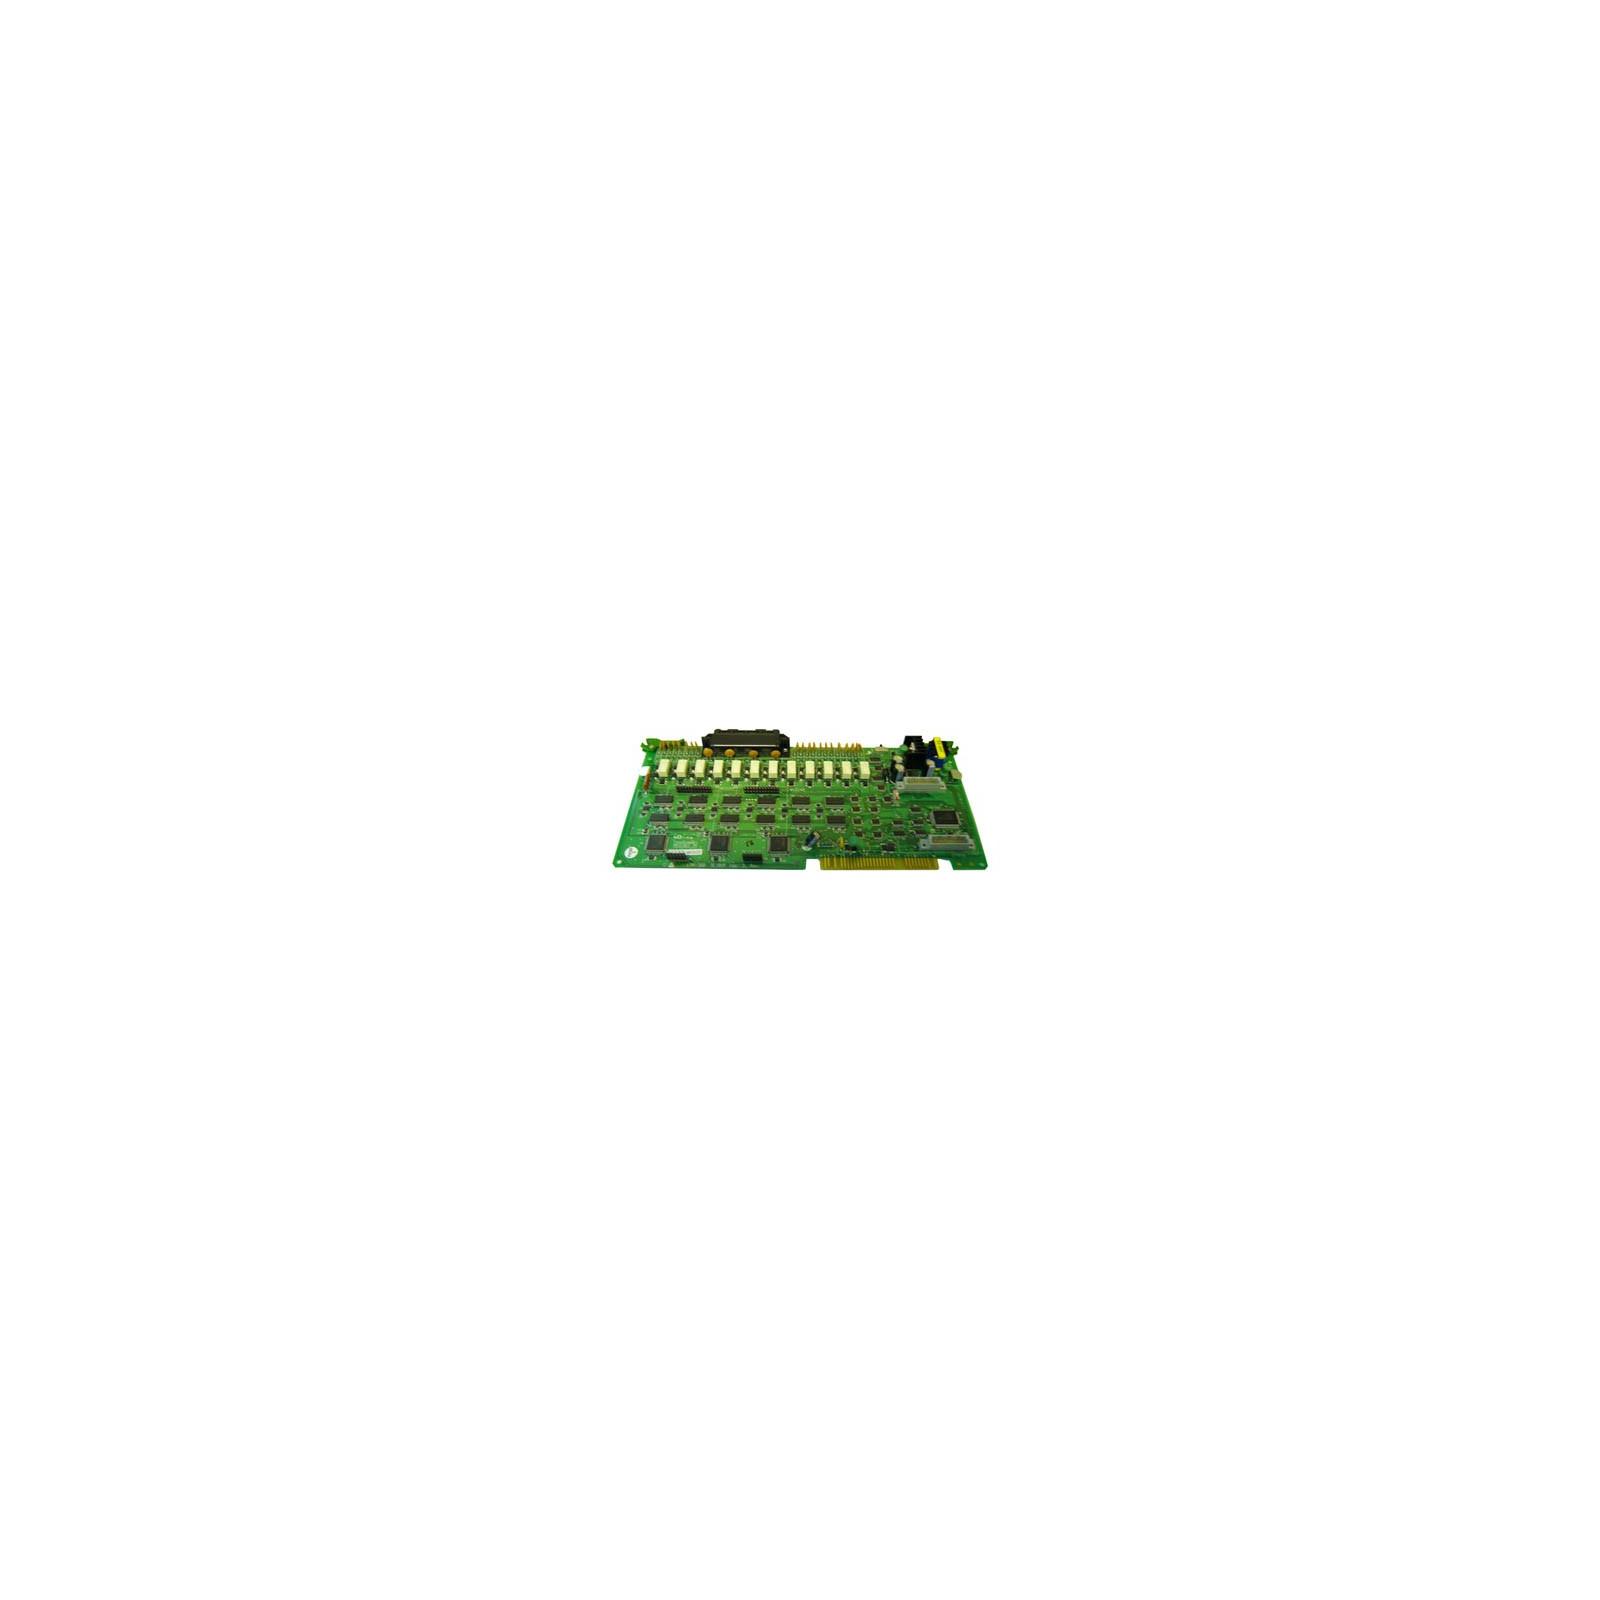 Оборудование для АТС LG D300-SLB2E